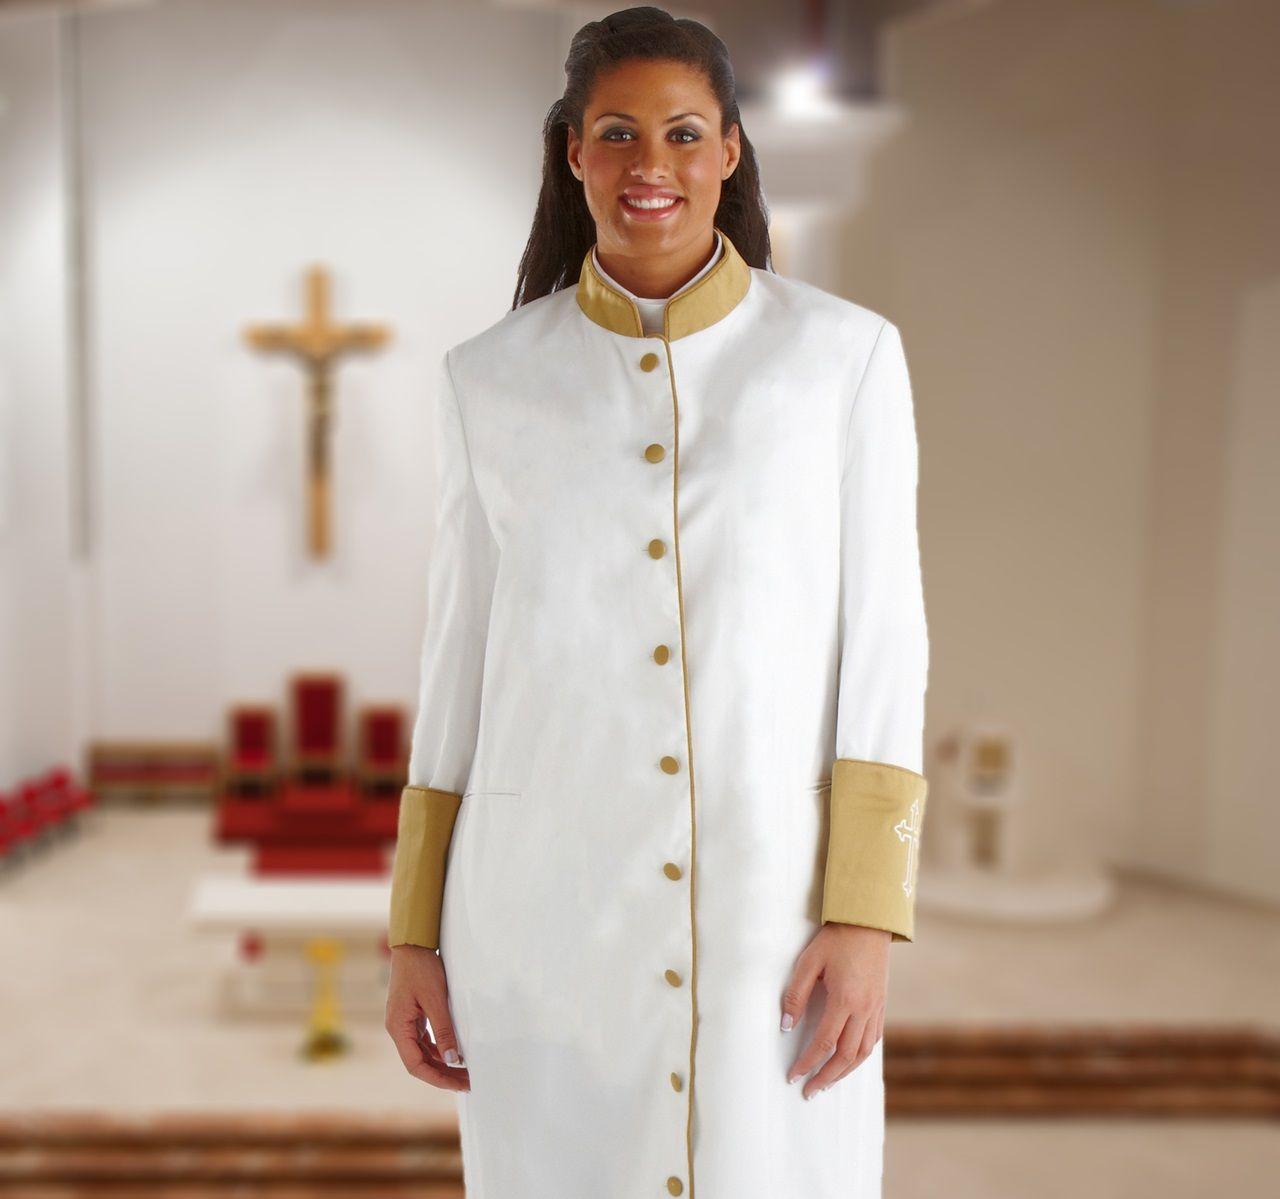 Womens White & Gold Cassock Clergy Robe